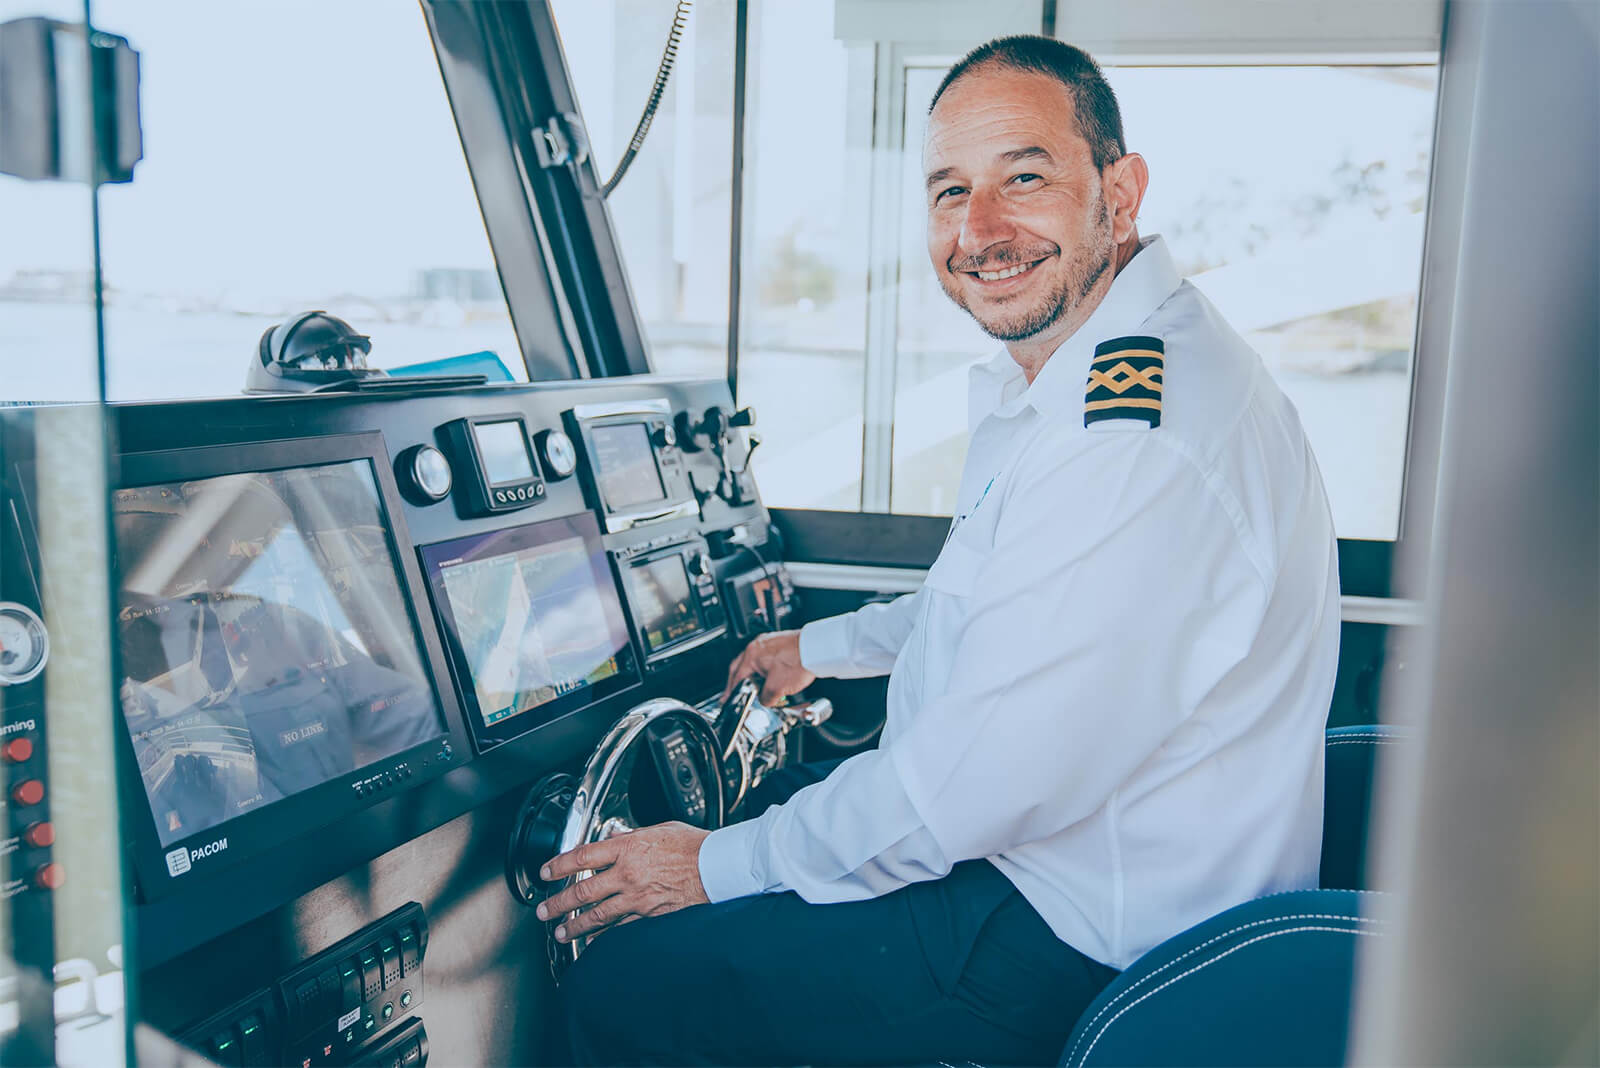 CityCat Captain